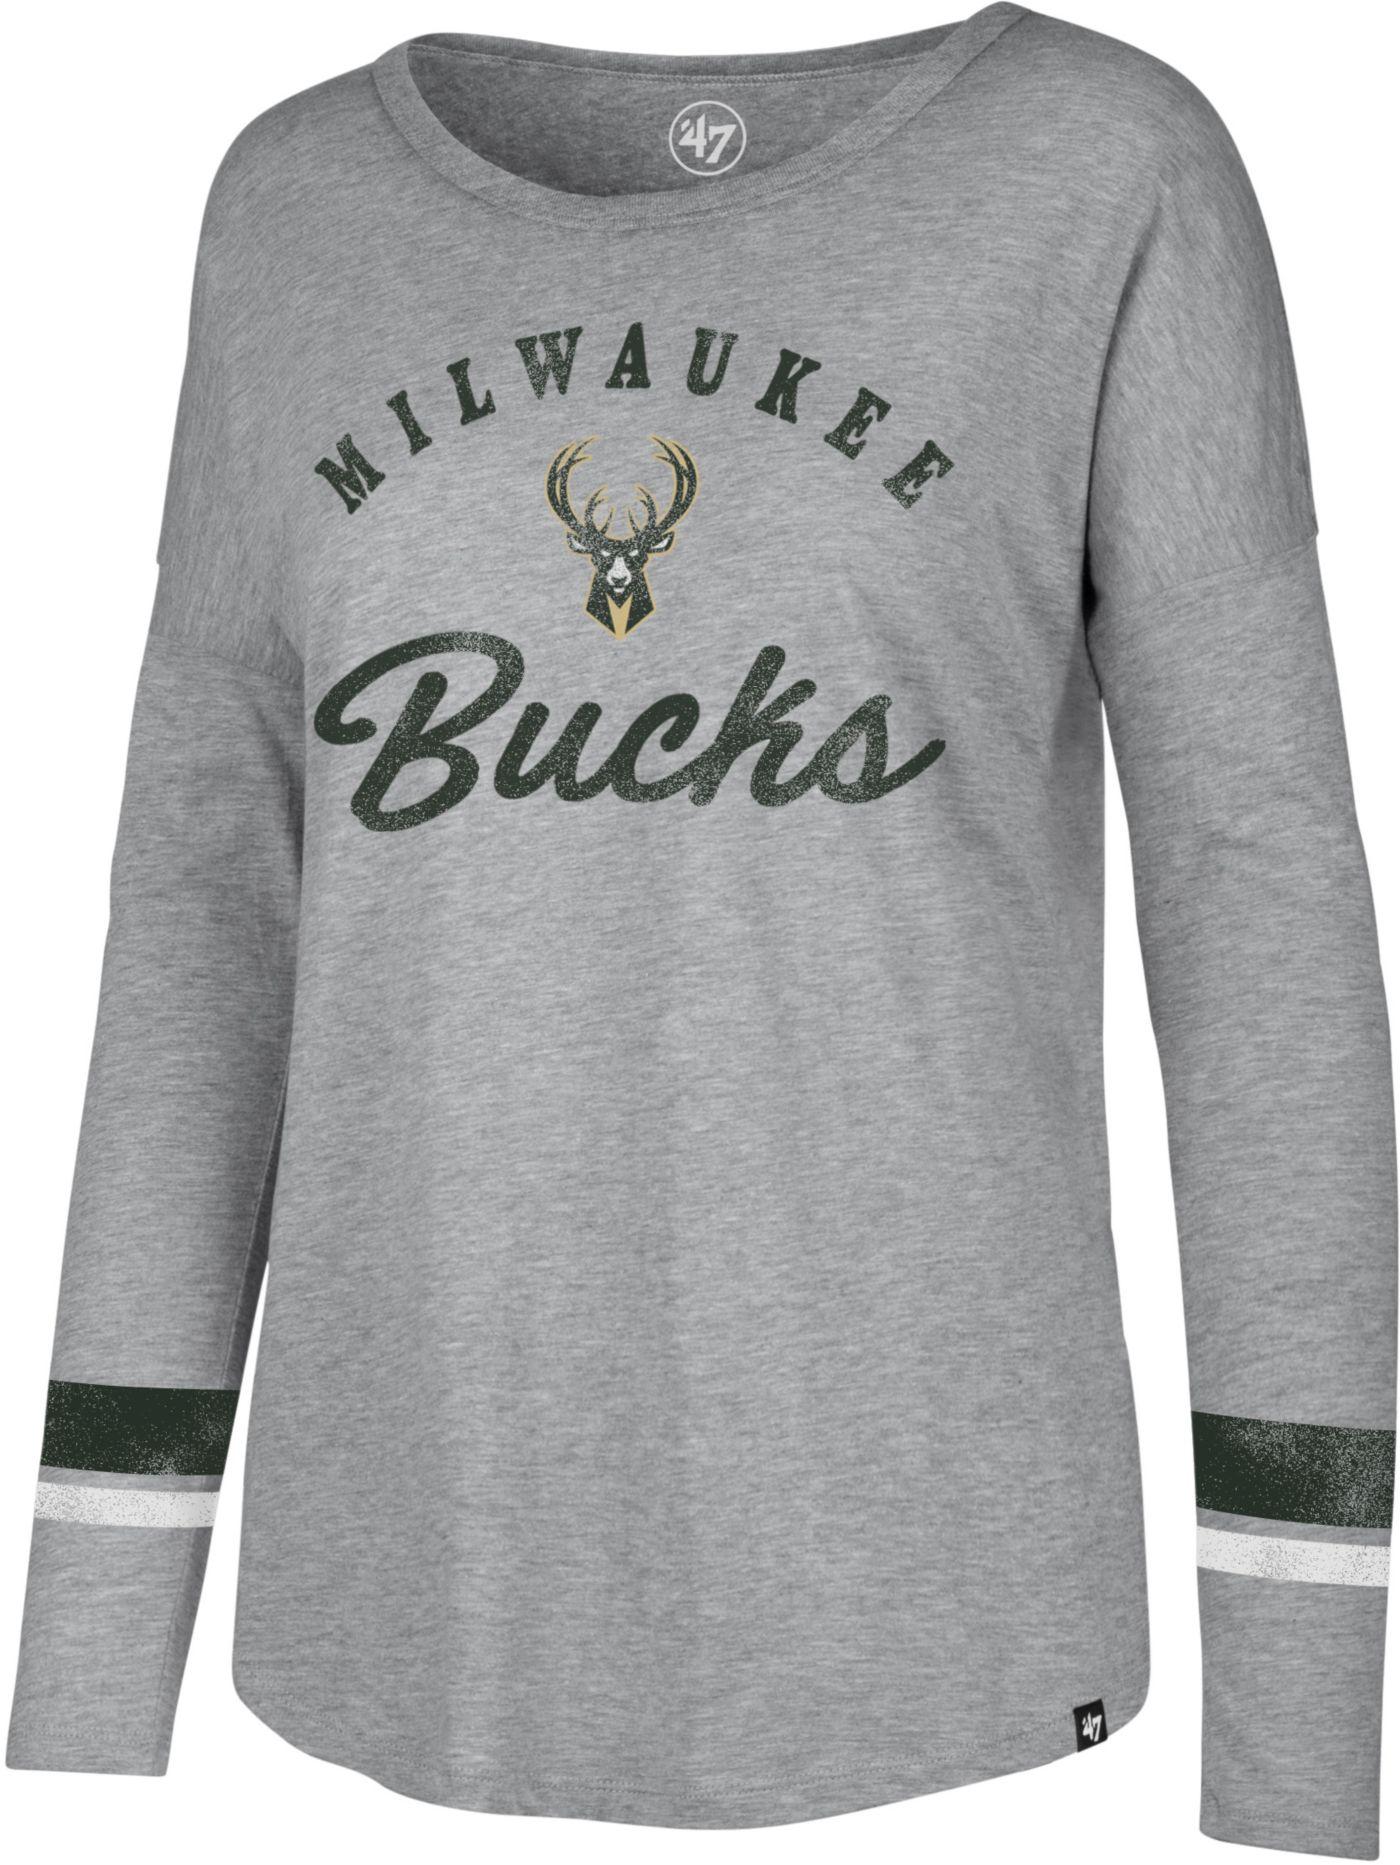 '47 Women's Milwaukee Bucks Long Sleeve Shirt